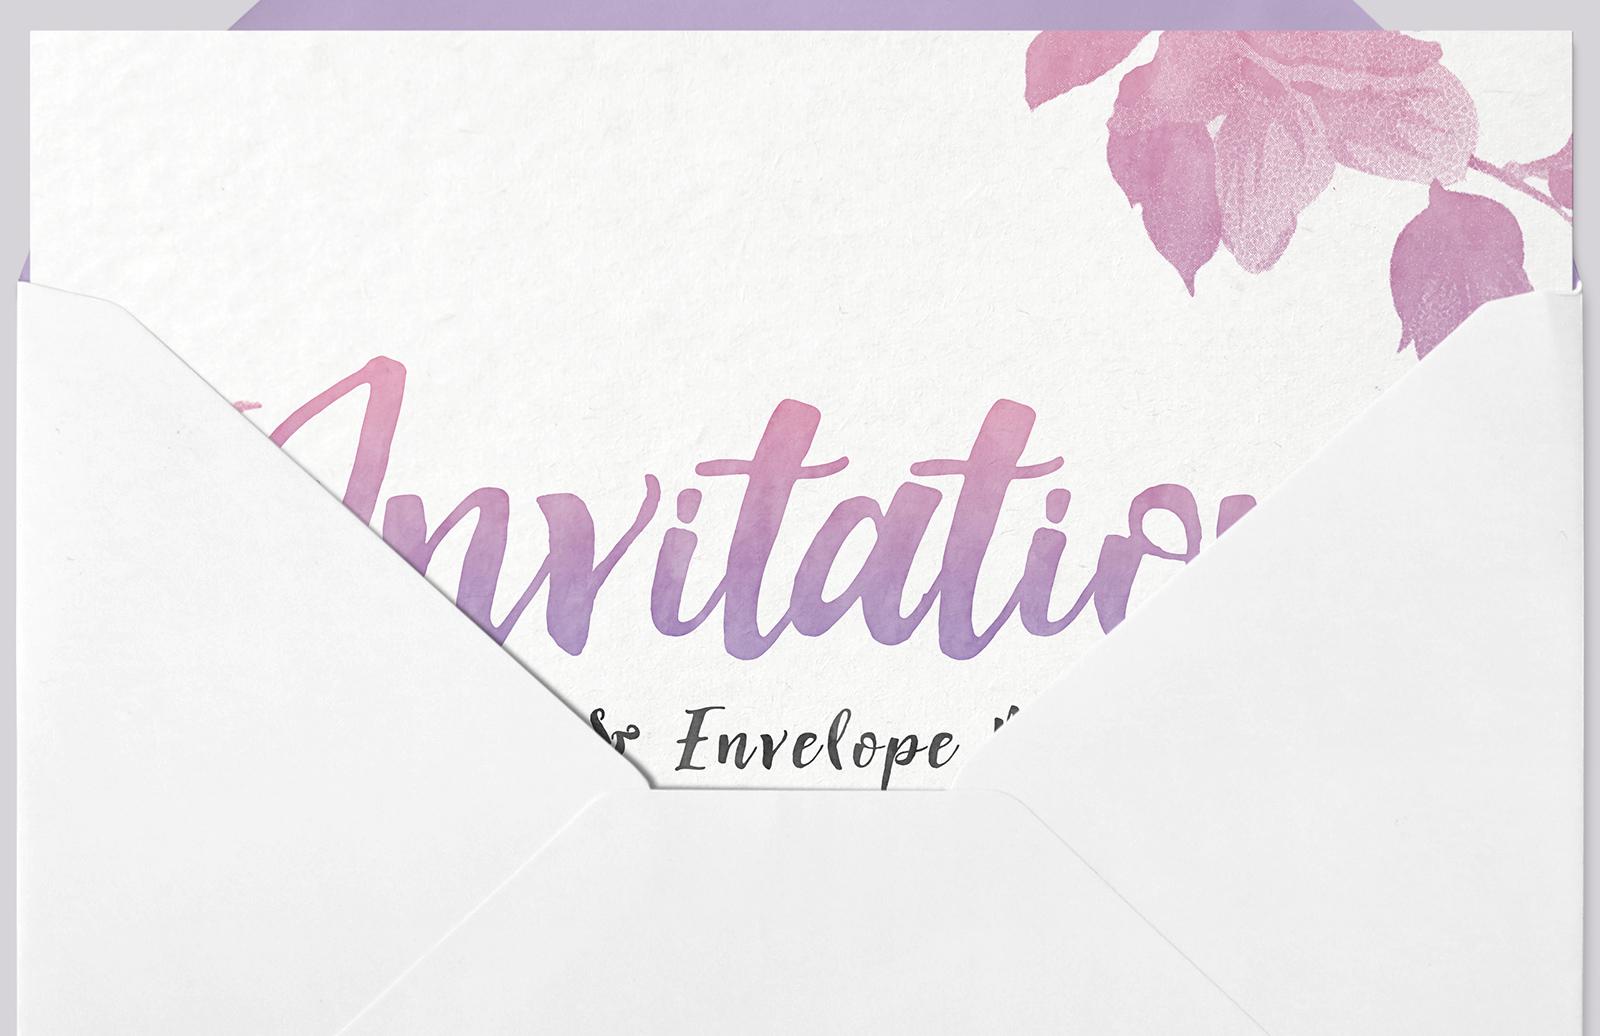 Large Invitation  Card   Envelope  Mockup  Preview 2